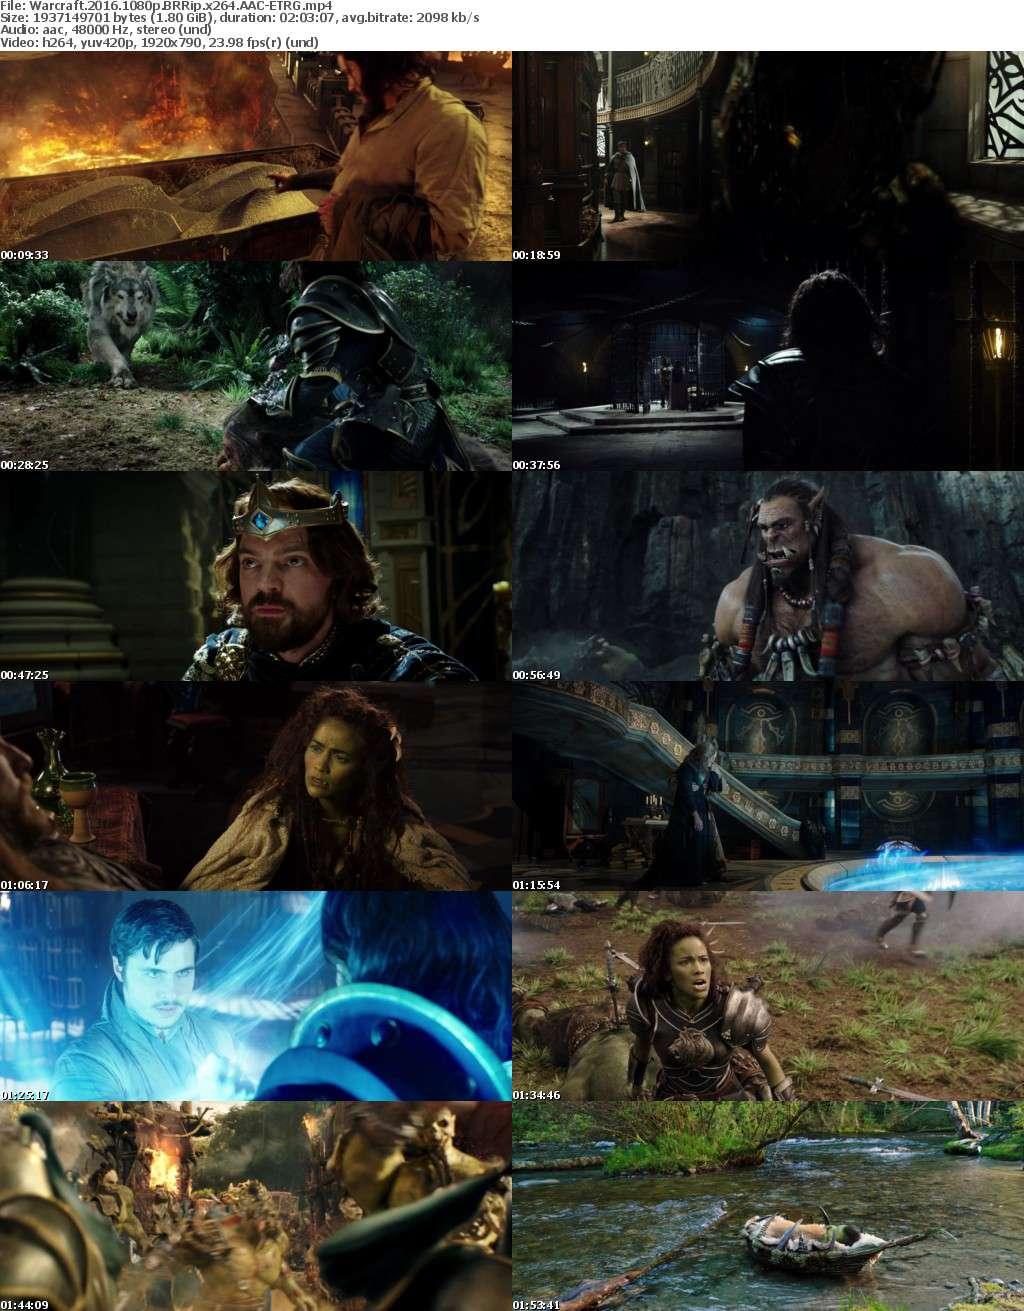 Warcraft 2016 1080p BRRip x264 AAC ETRG